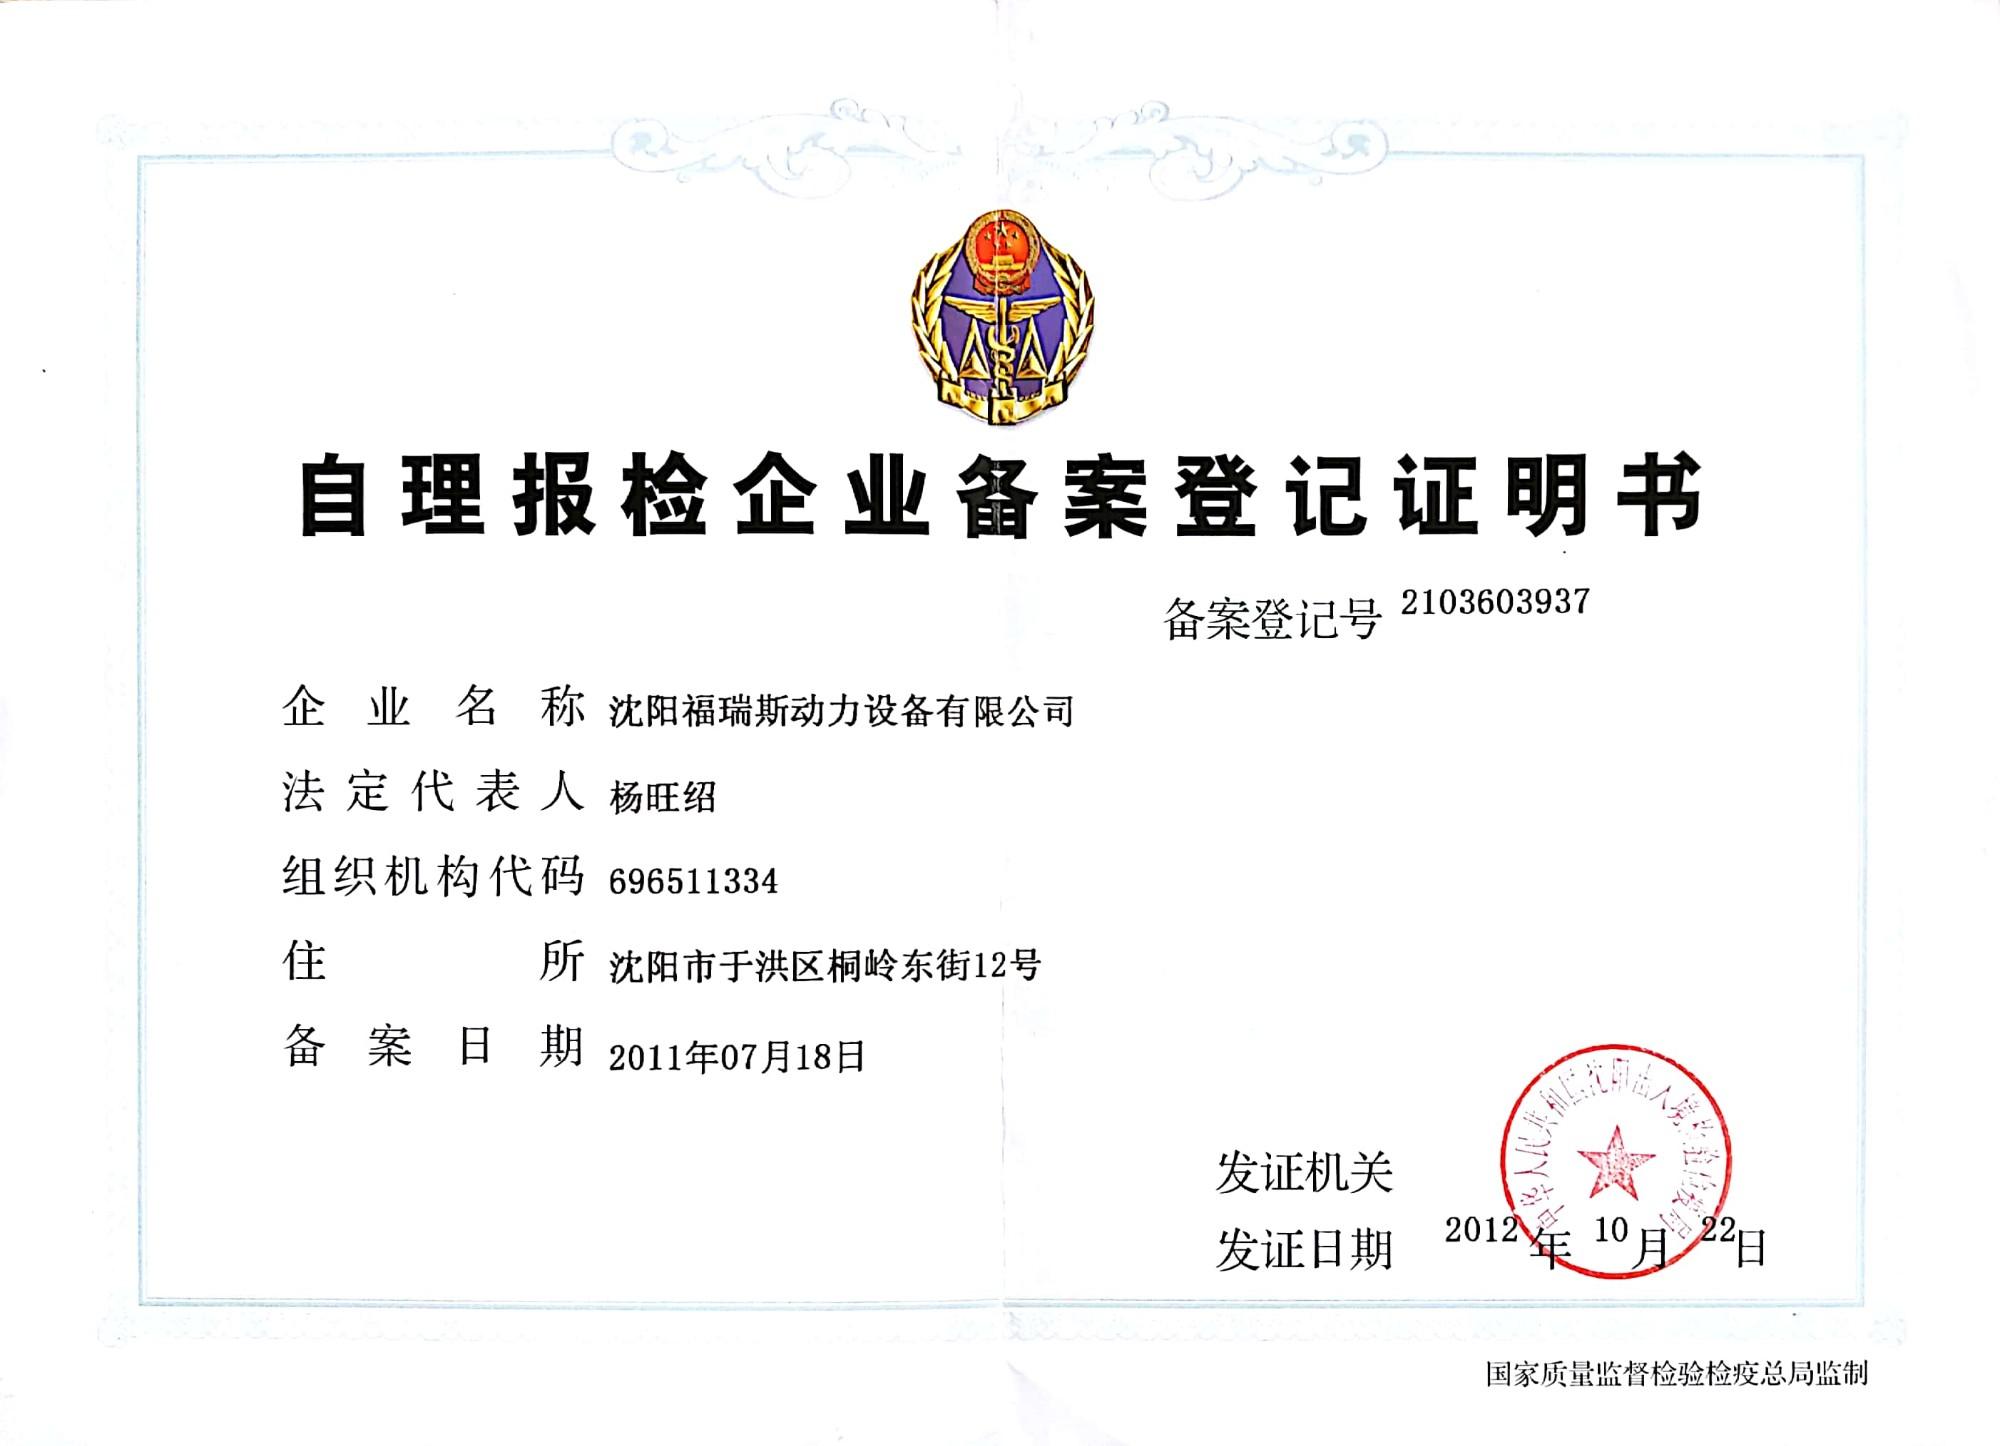 China Entry-Exit Inspection and Quarantine Bureau Registration Certificate